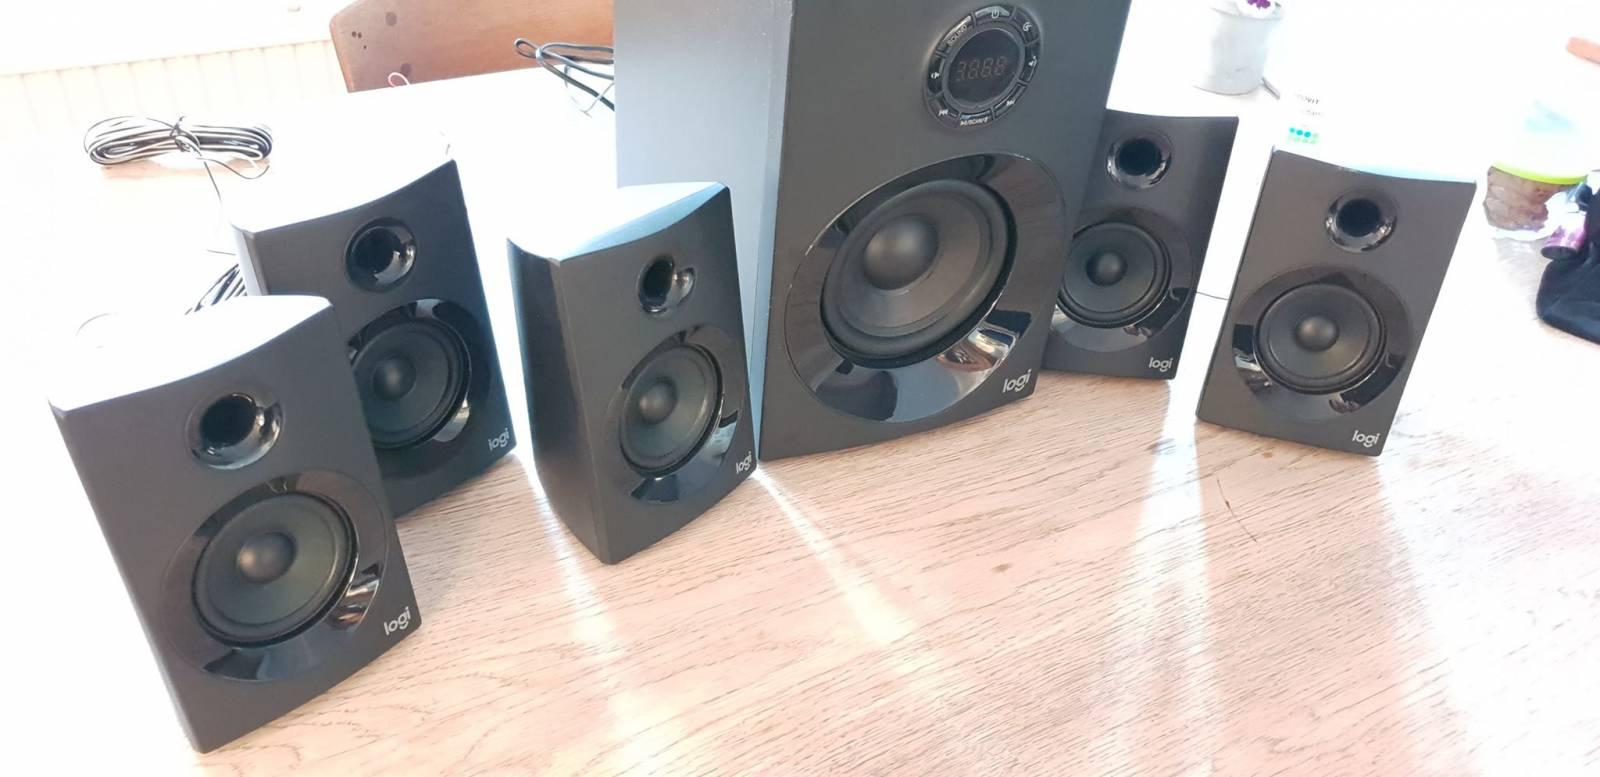 Birdseye view of speakers